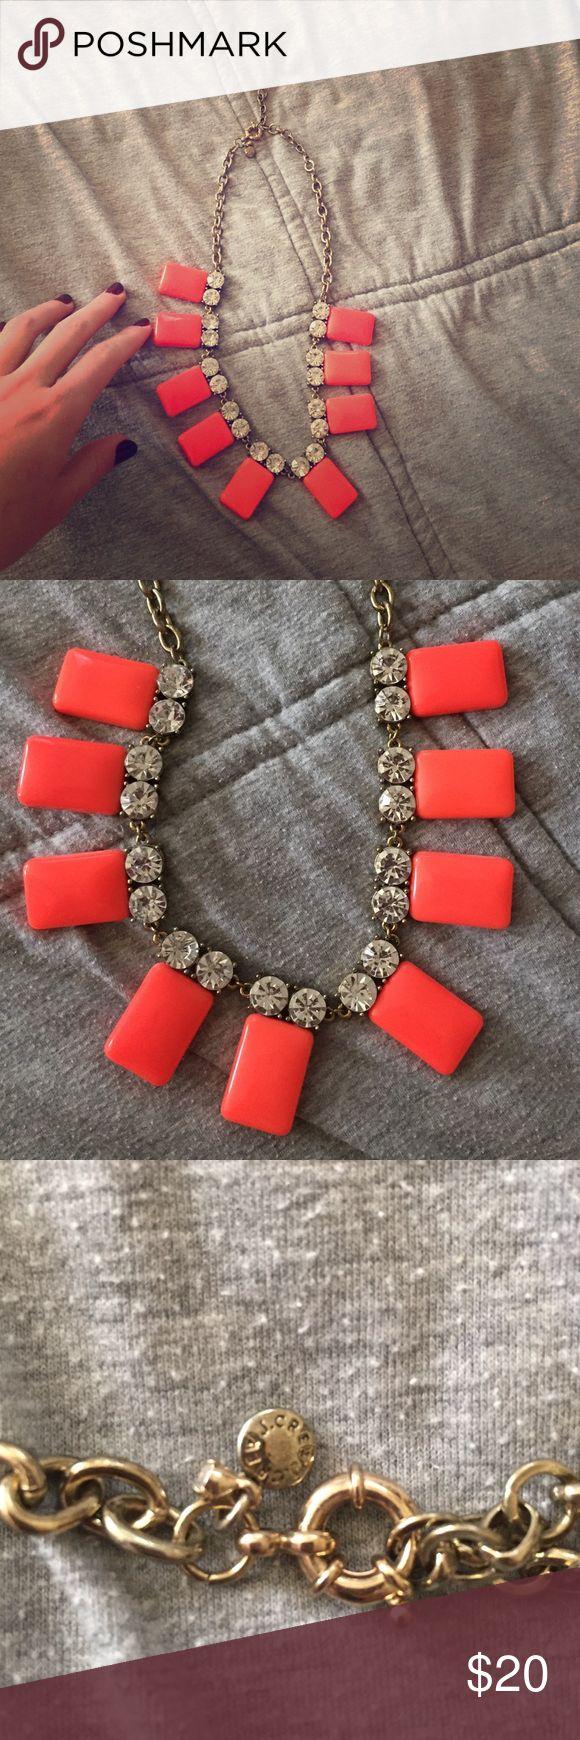 🌟BUNDLE🌟J. Crew coral statement necklace Gorgeous coral statement piece! 🌟BUNDLE for a discount! J. Crew Jewelry Necklaces